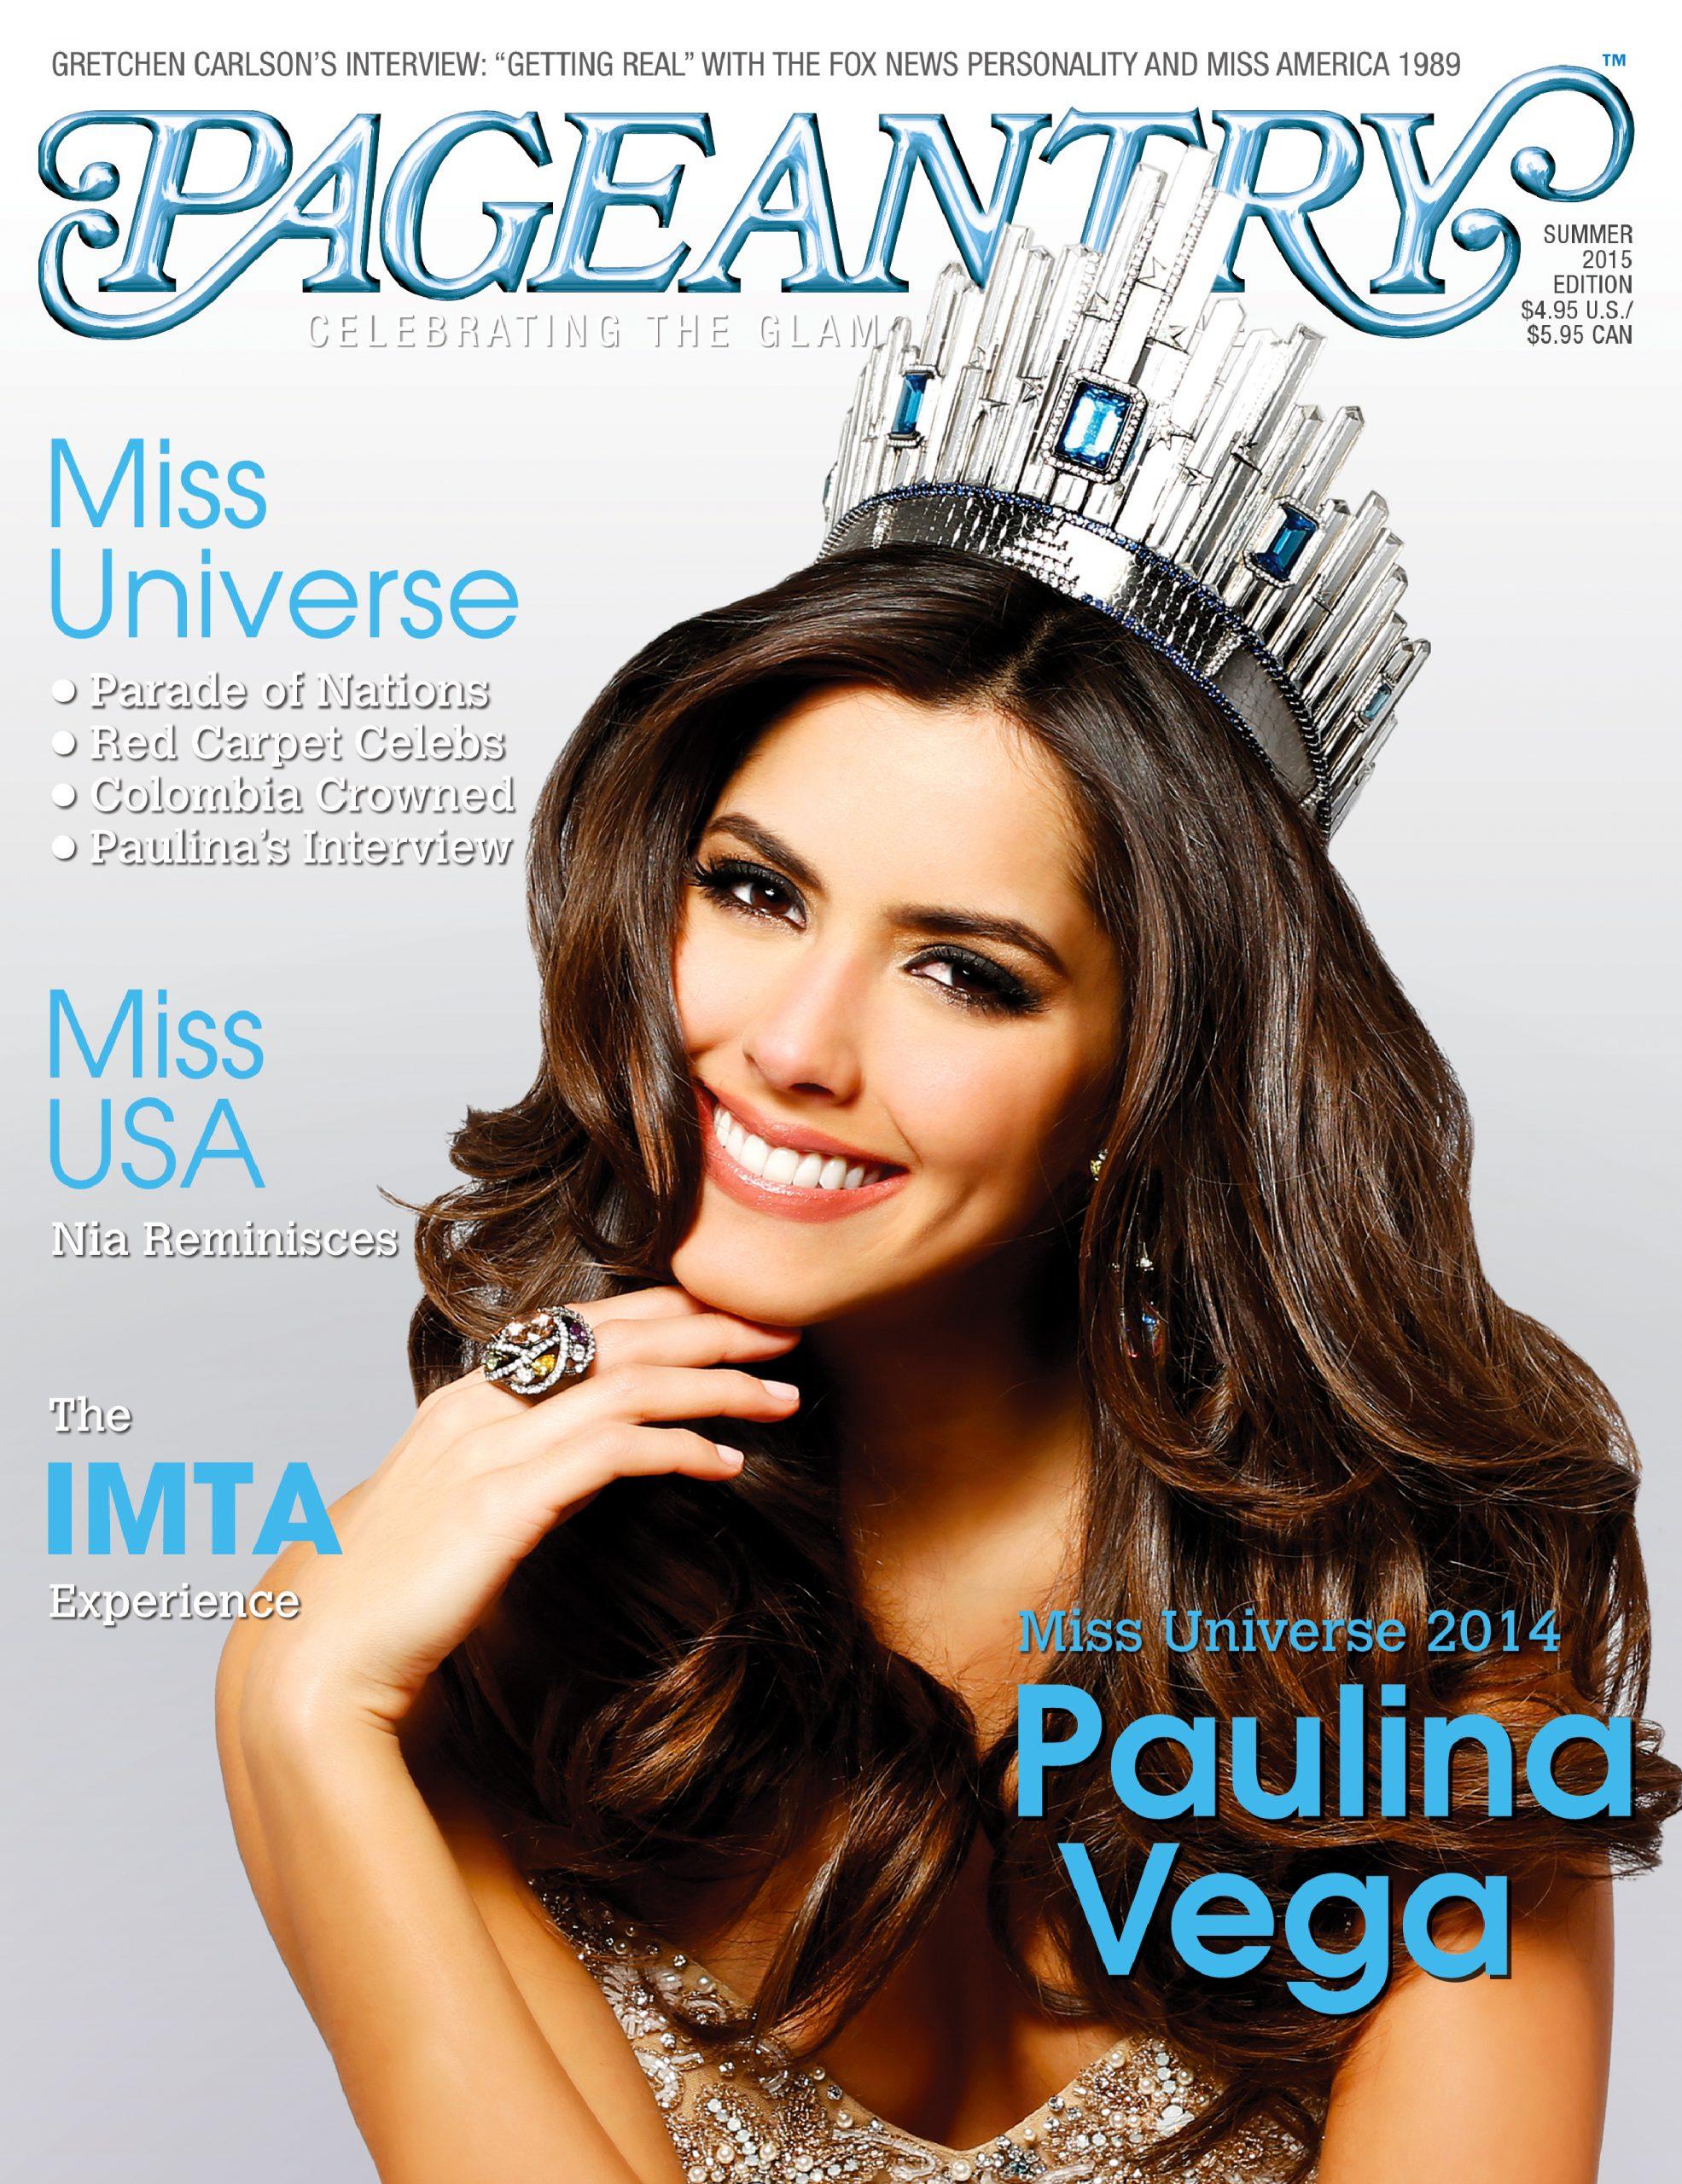 Miss Universe, pageant, pageantry, Paulina Vega, Miss USA, IMTA